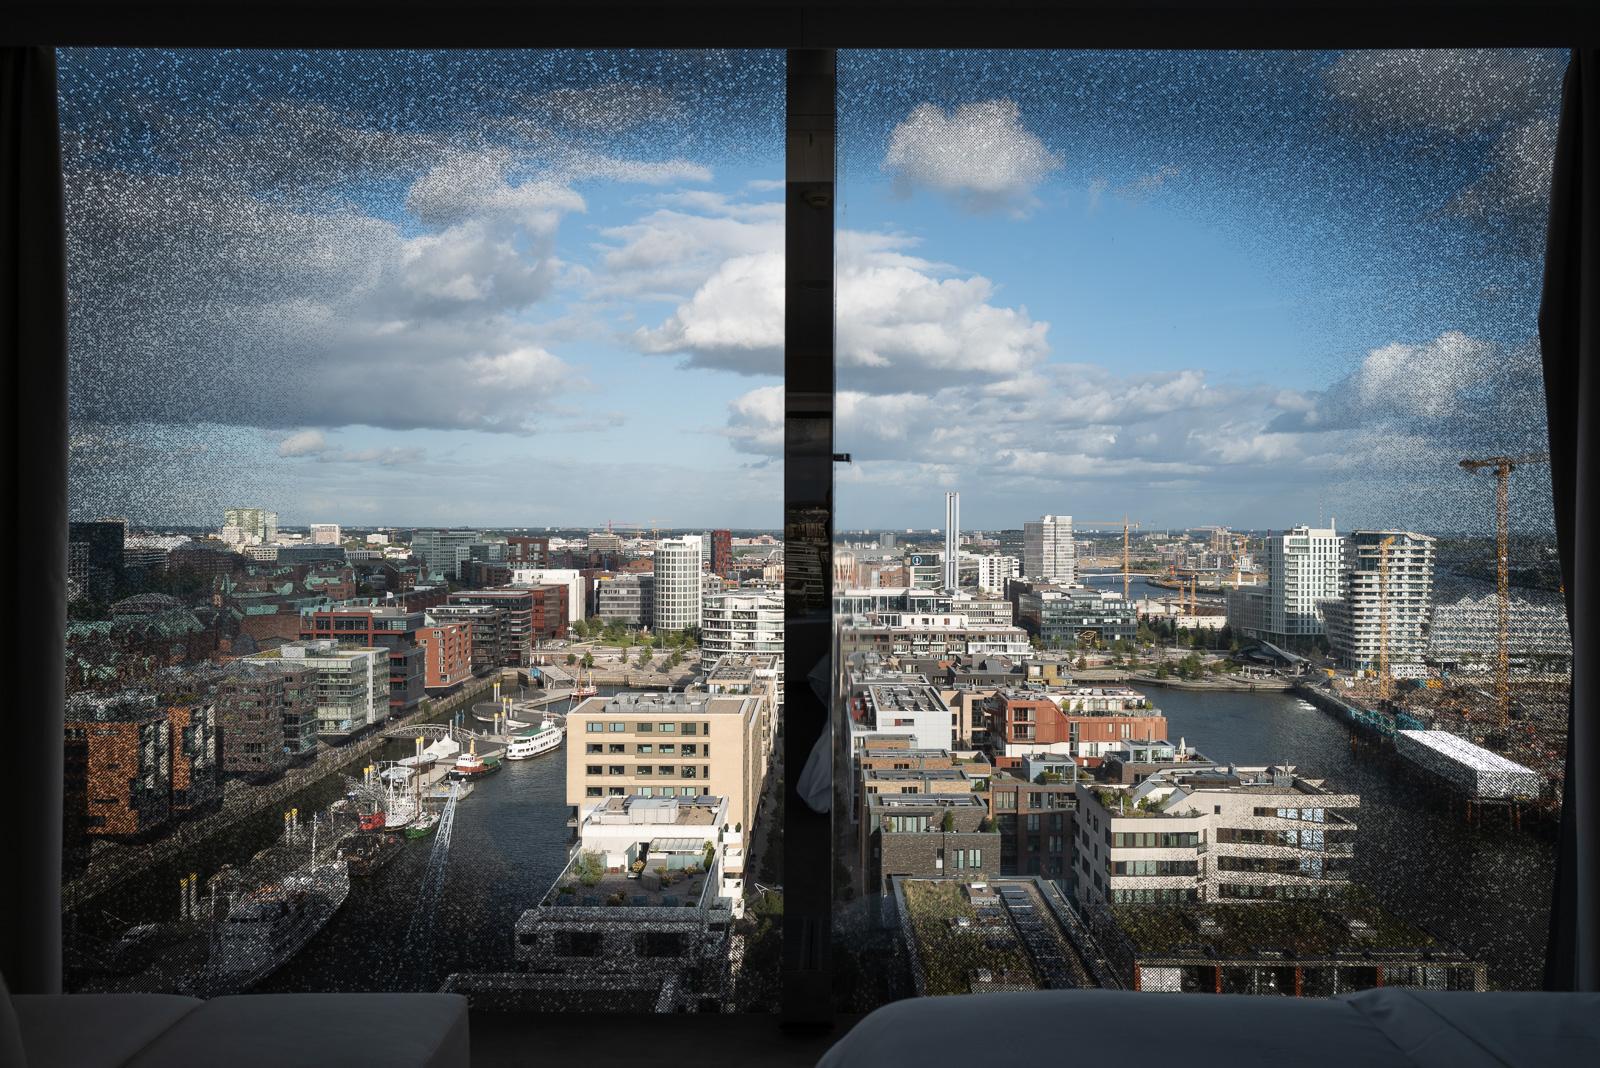 Room 1628, The Westin Hamburg (Elbphilharmonie), Hamburg/Germany